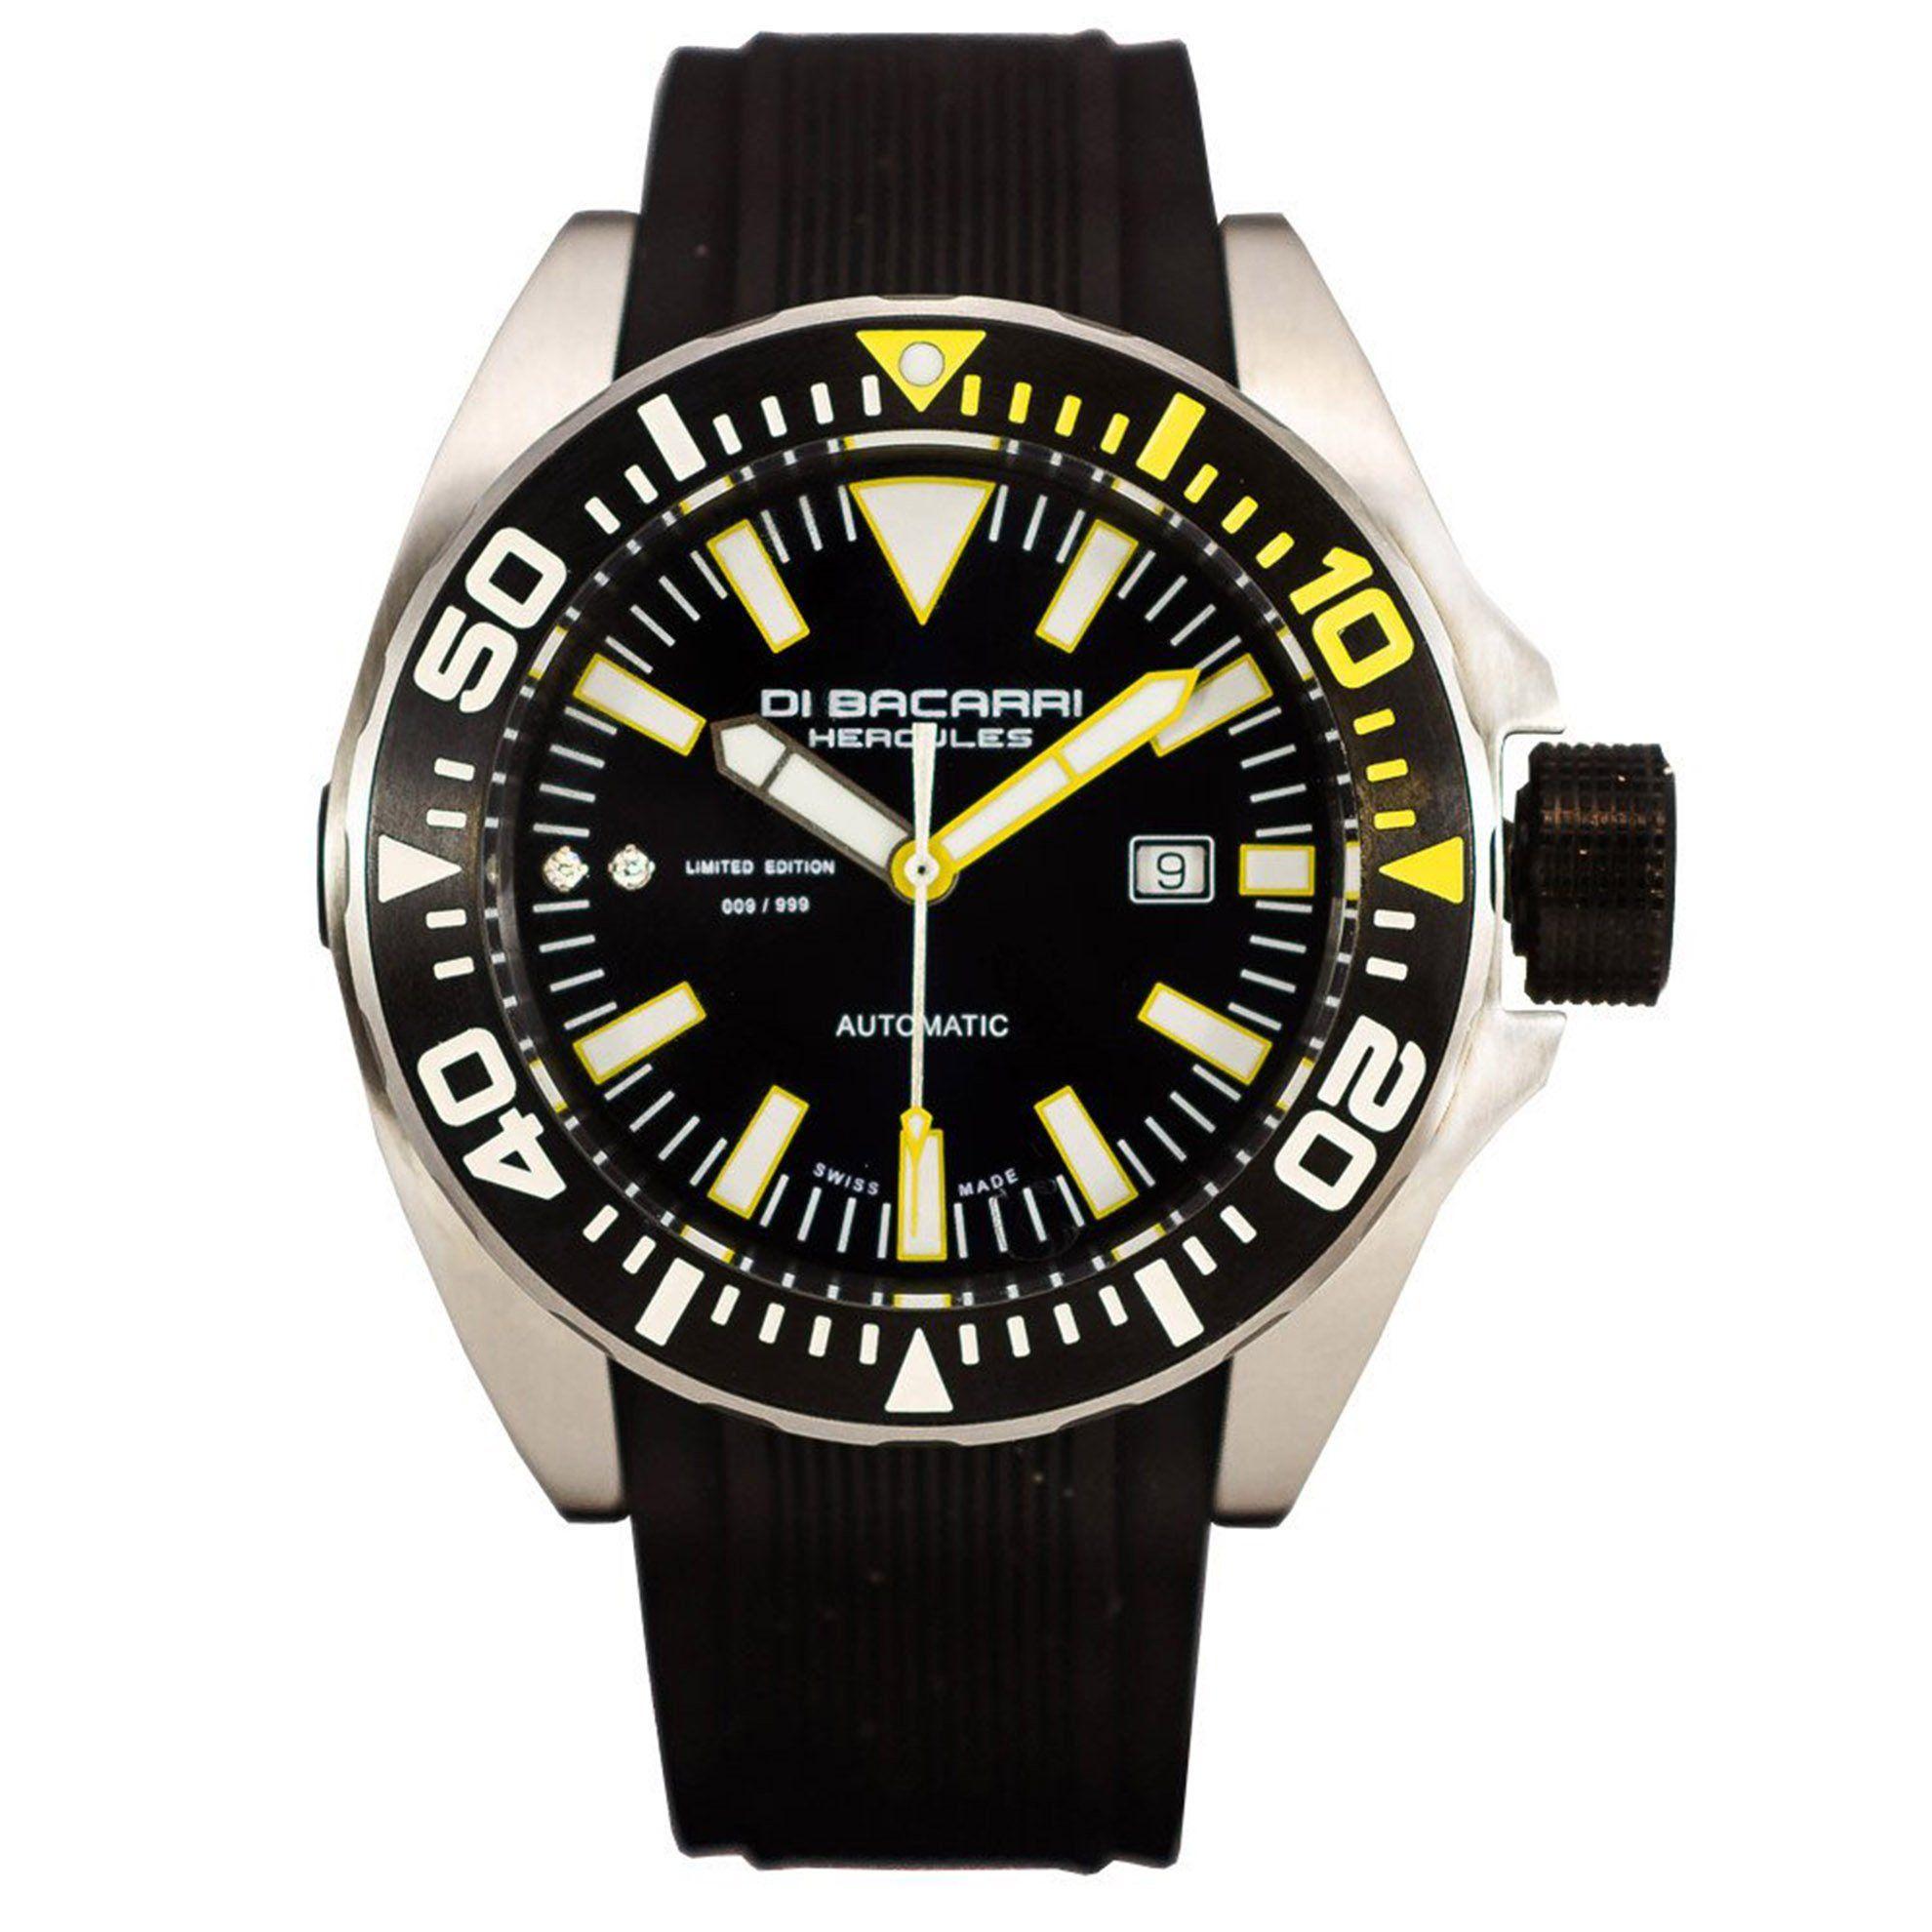 Di Bacarri Hercules Diamond Limited Edition ETA2824 Swiss Made Automatic Black Yellow